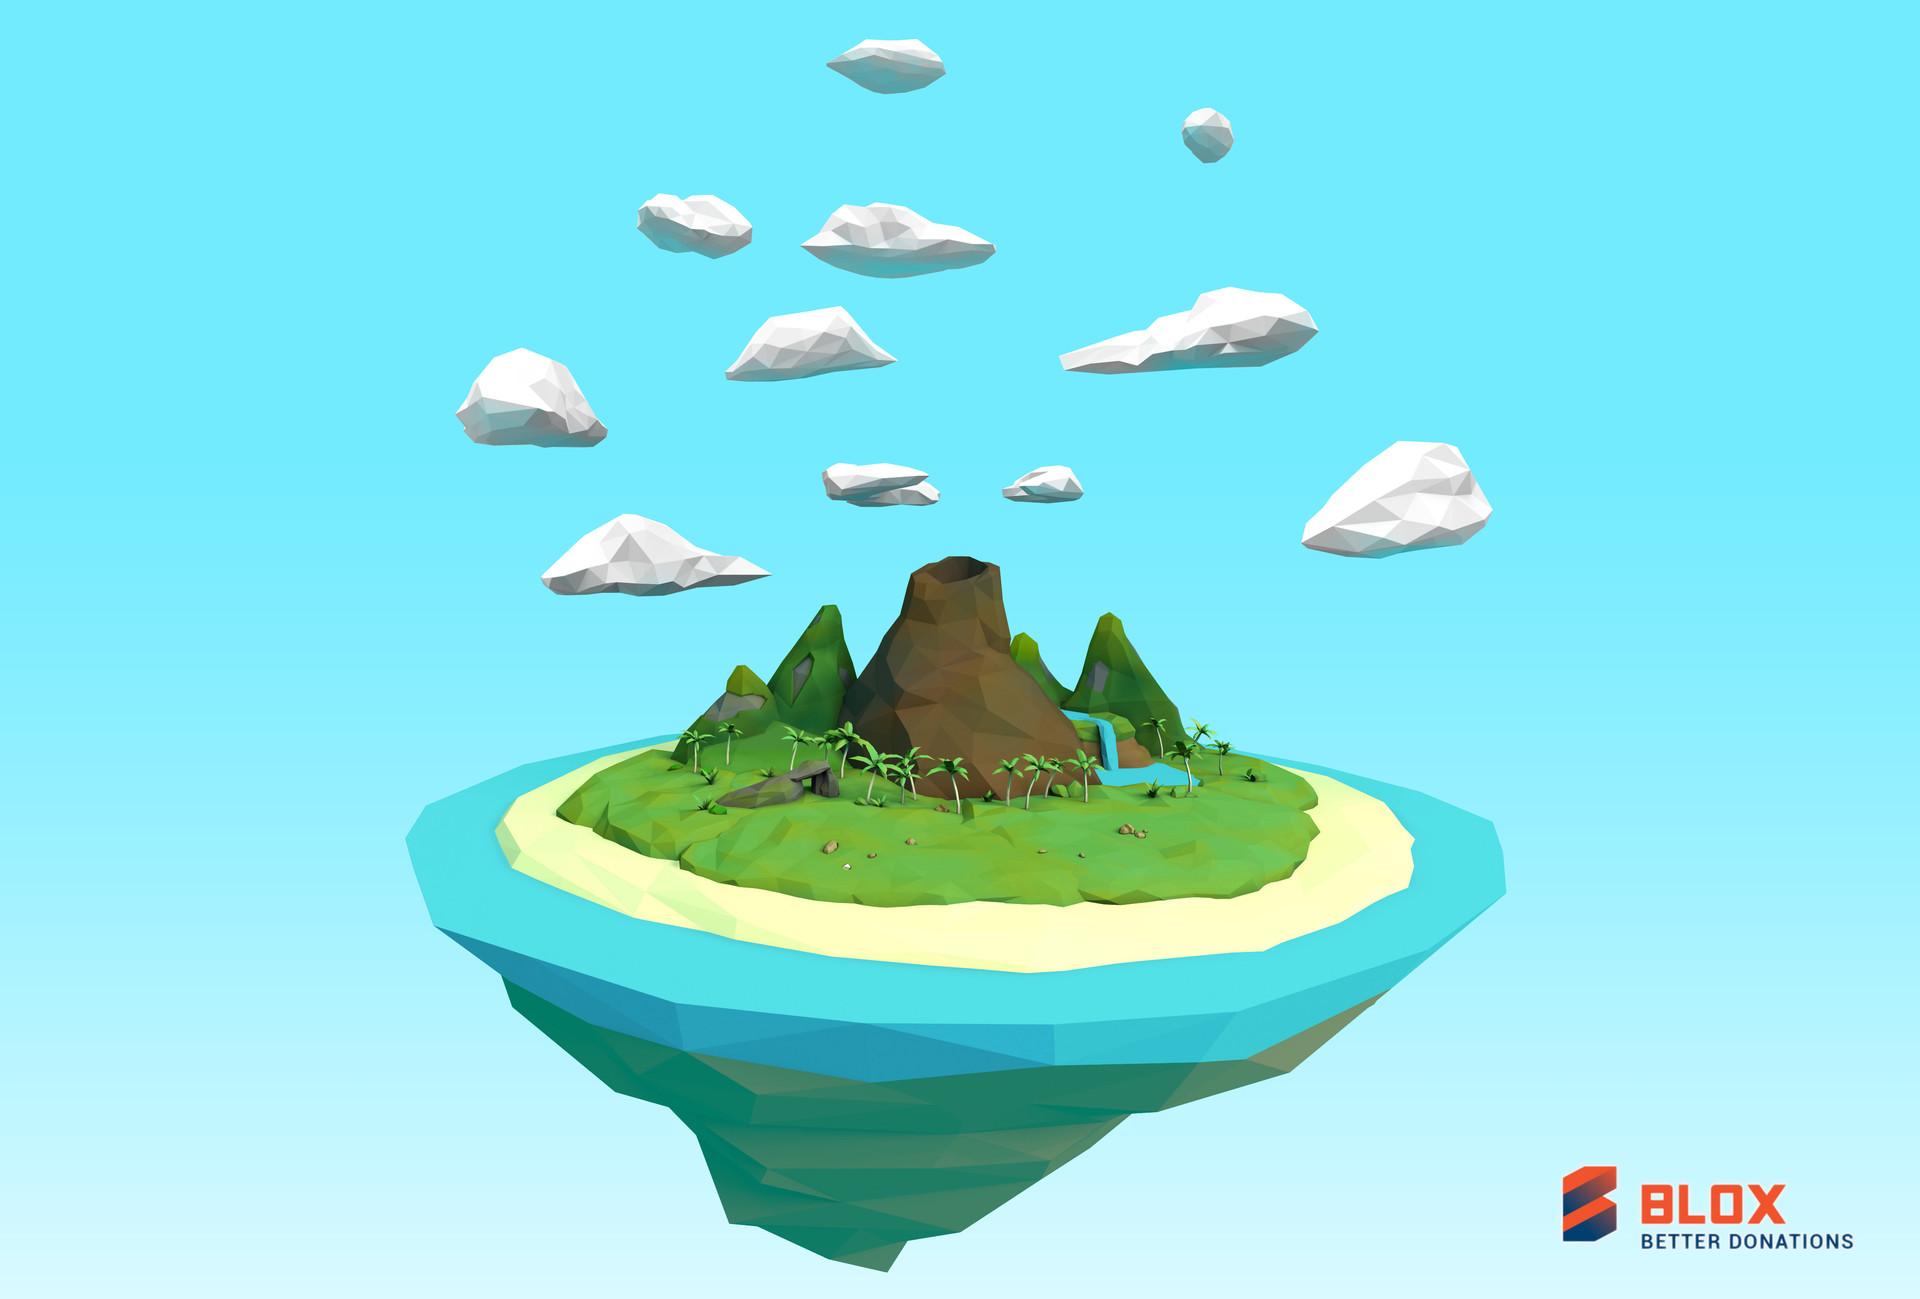 Matthew ramirez blox island 004